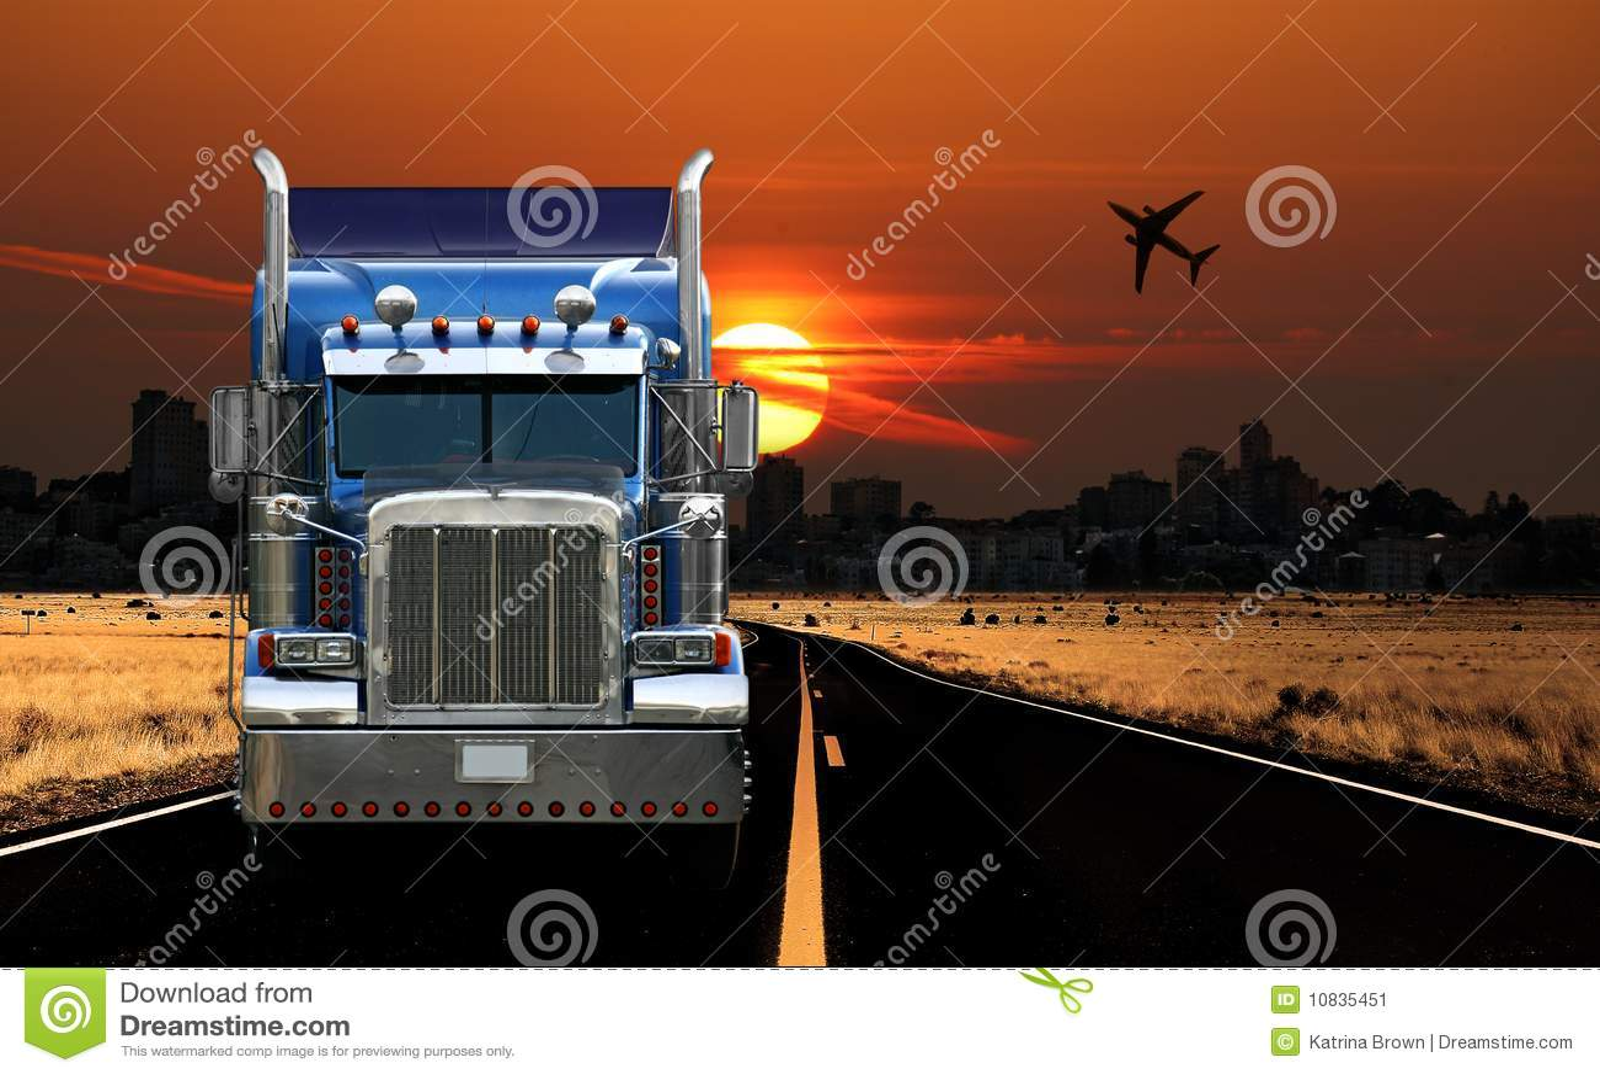 Trucking City View at Sunrise